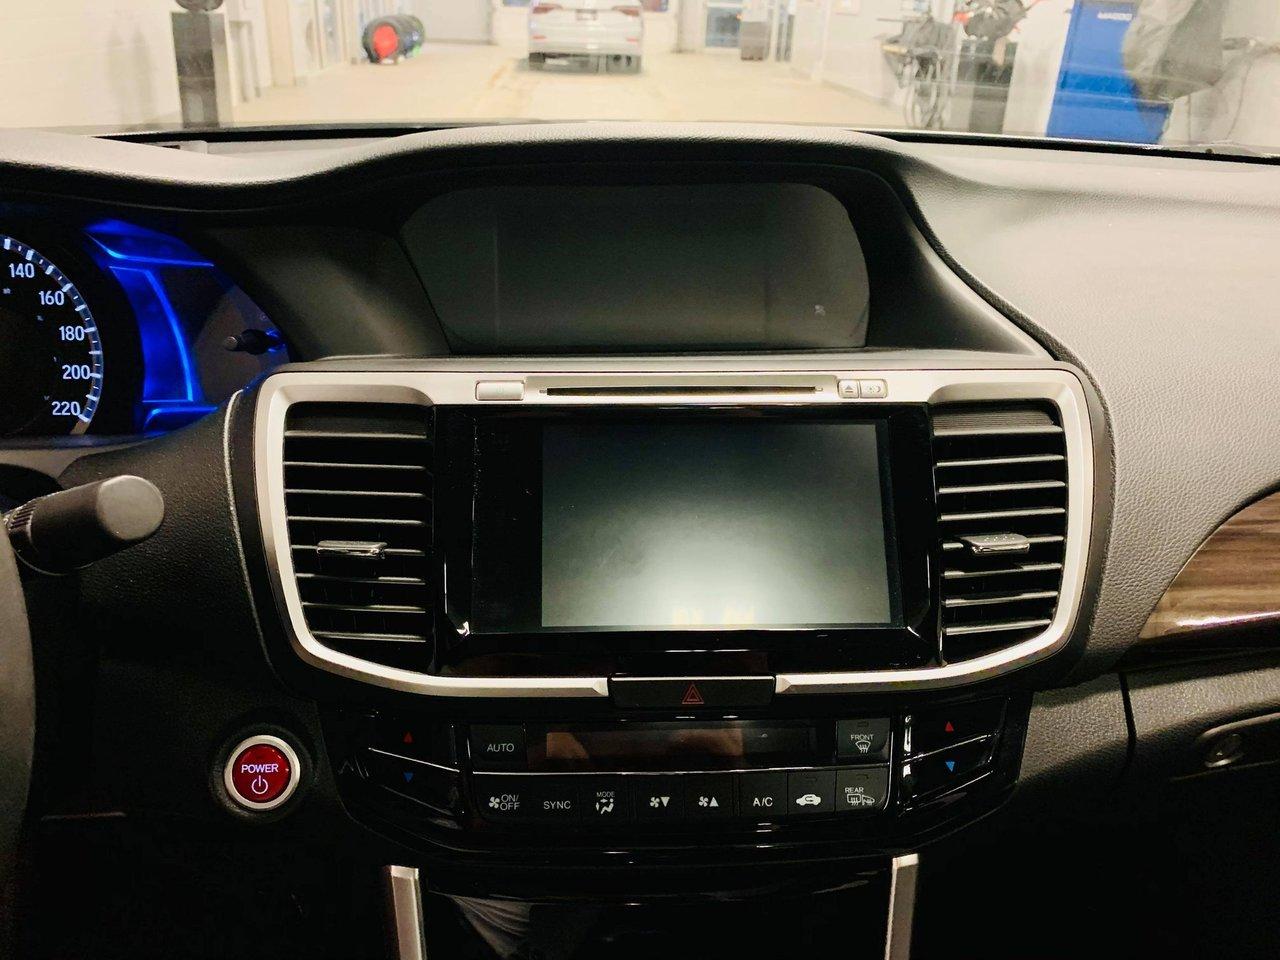 2017 Honda Accord Hybrid 4dr Sdn Touring / JAMAIS ACCIDENTEE